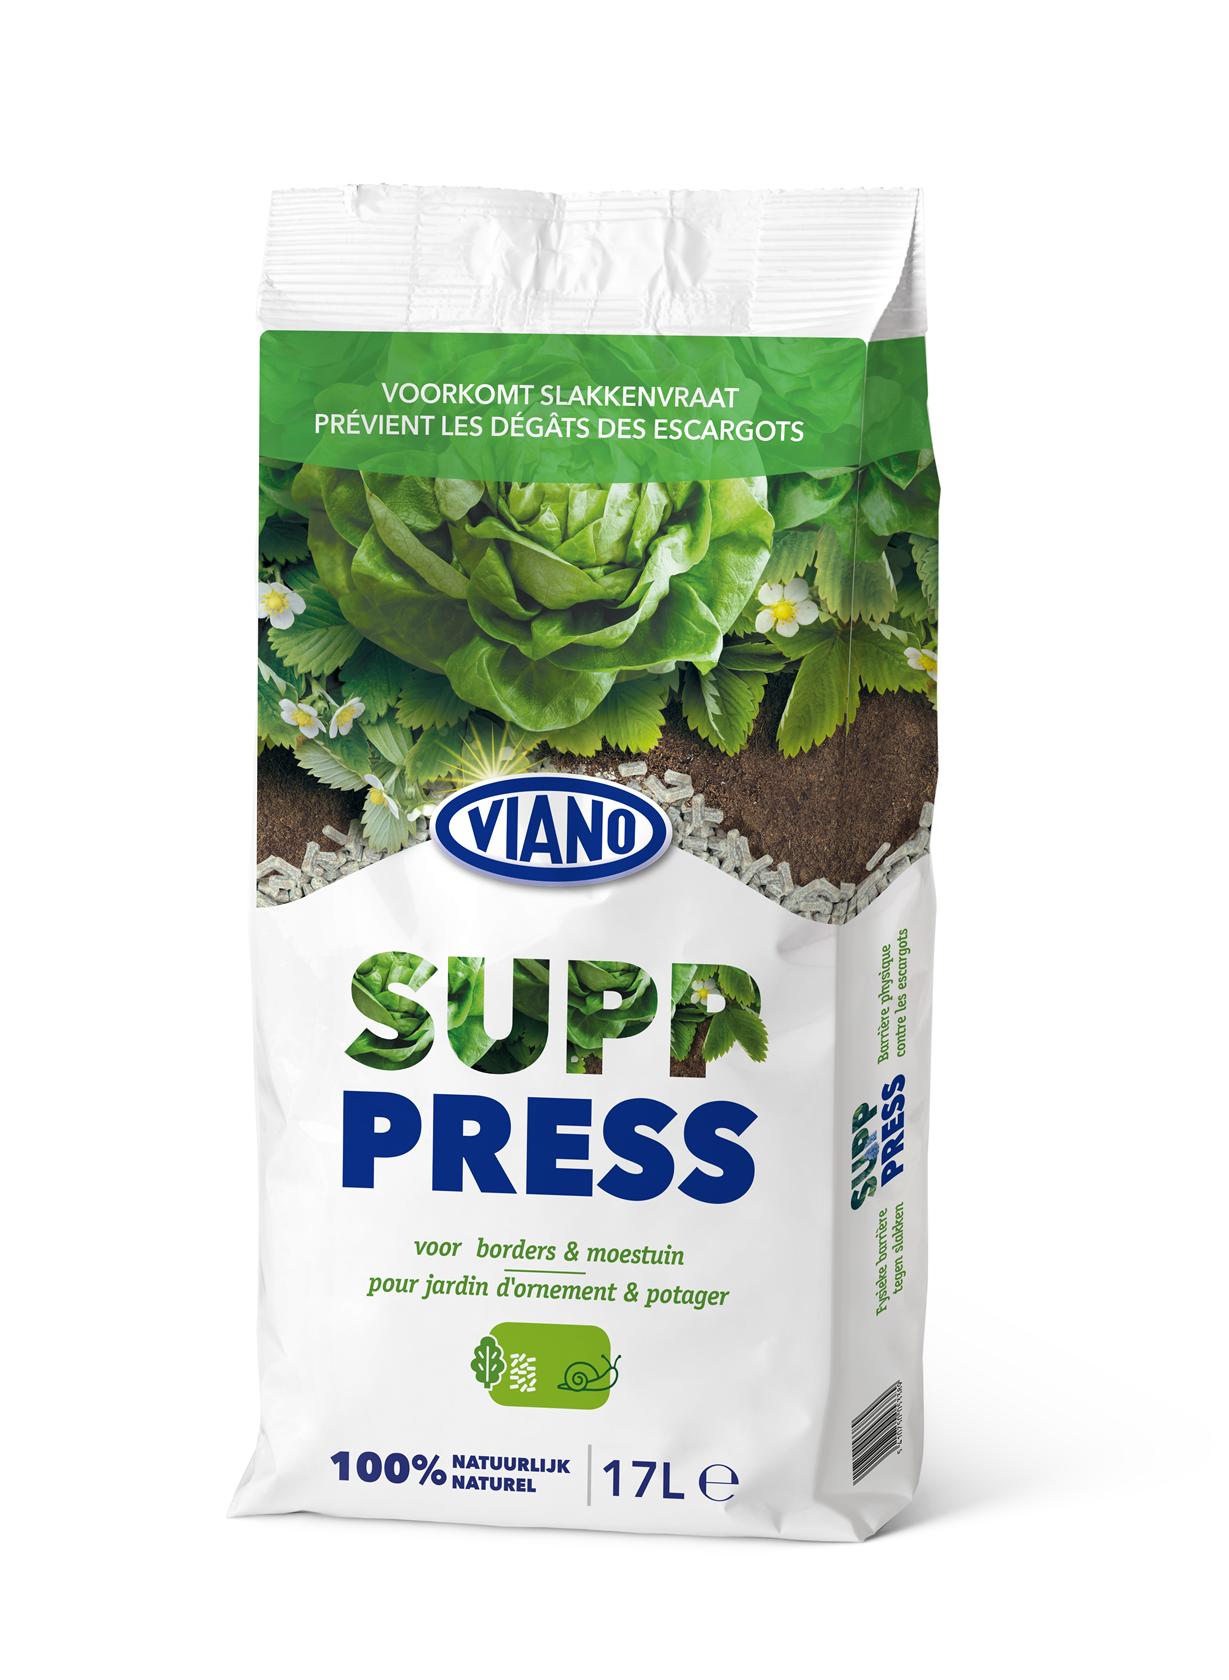 SUP-Press slakkenvraat - voorkomt slakkenvraat 17L